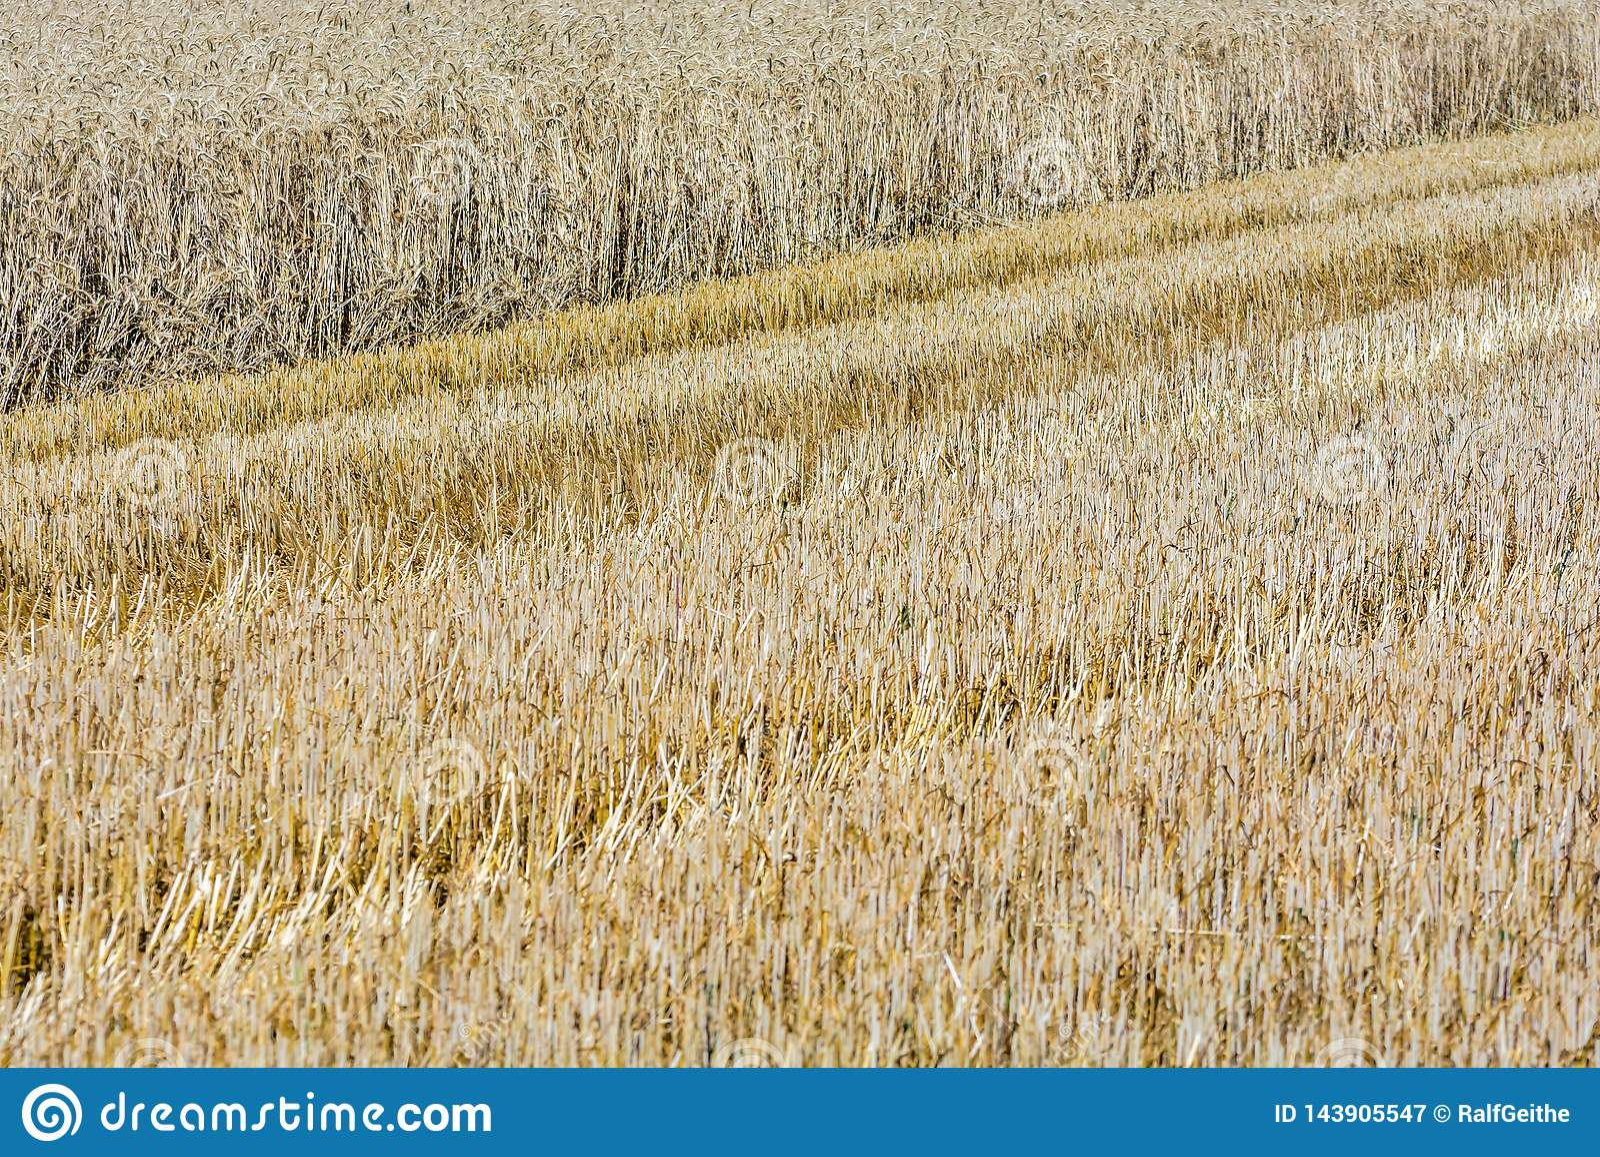 Gedeeltelijk geoogst graangewassengebied